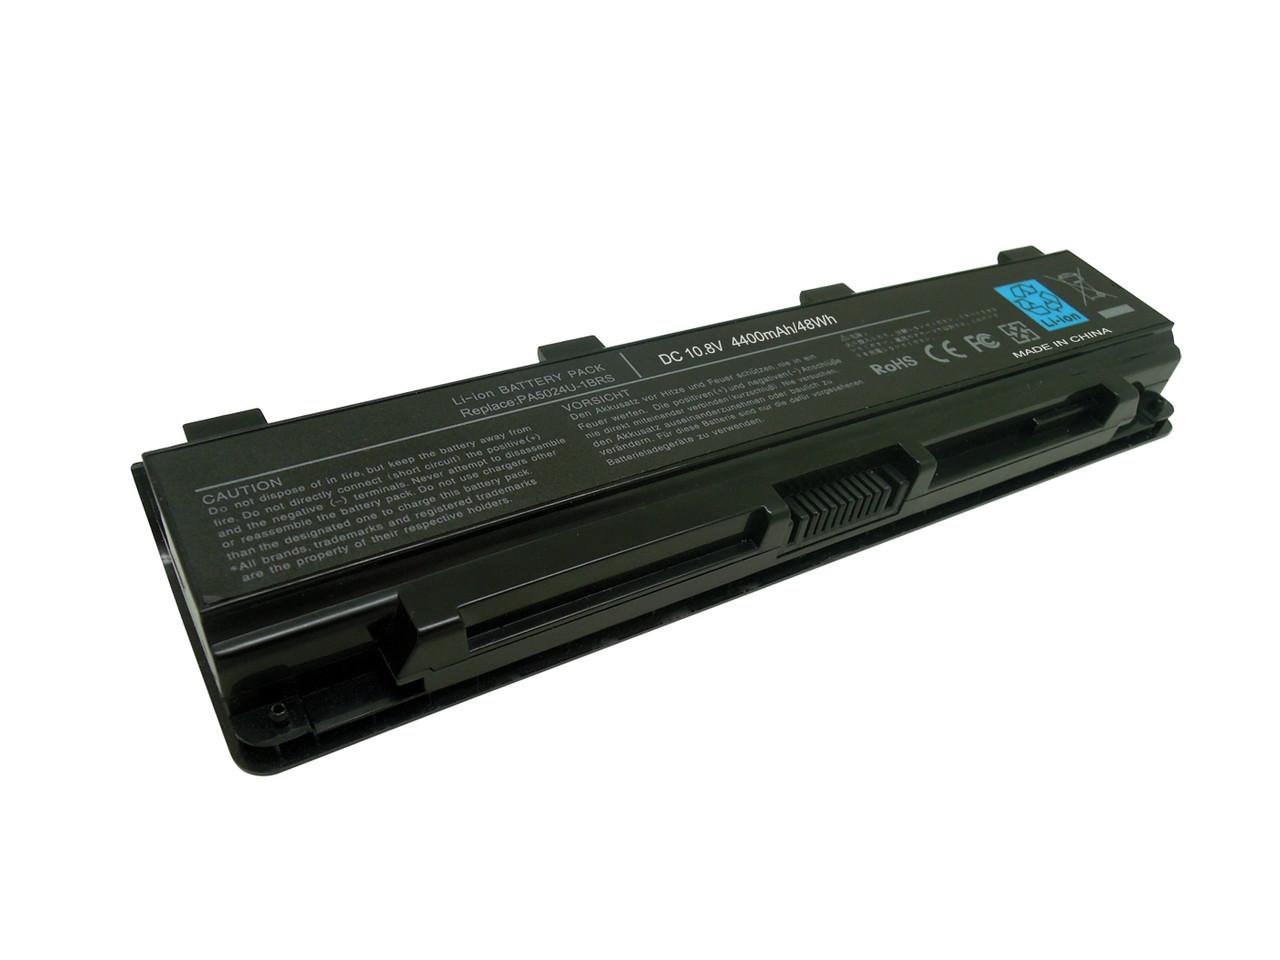 Аккумулятор для ноутбука TOSHIBA SATELLITE S855-S5268